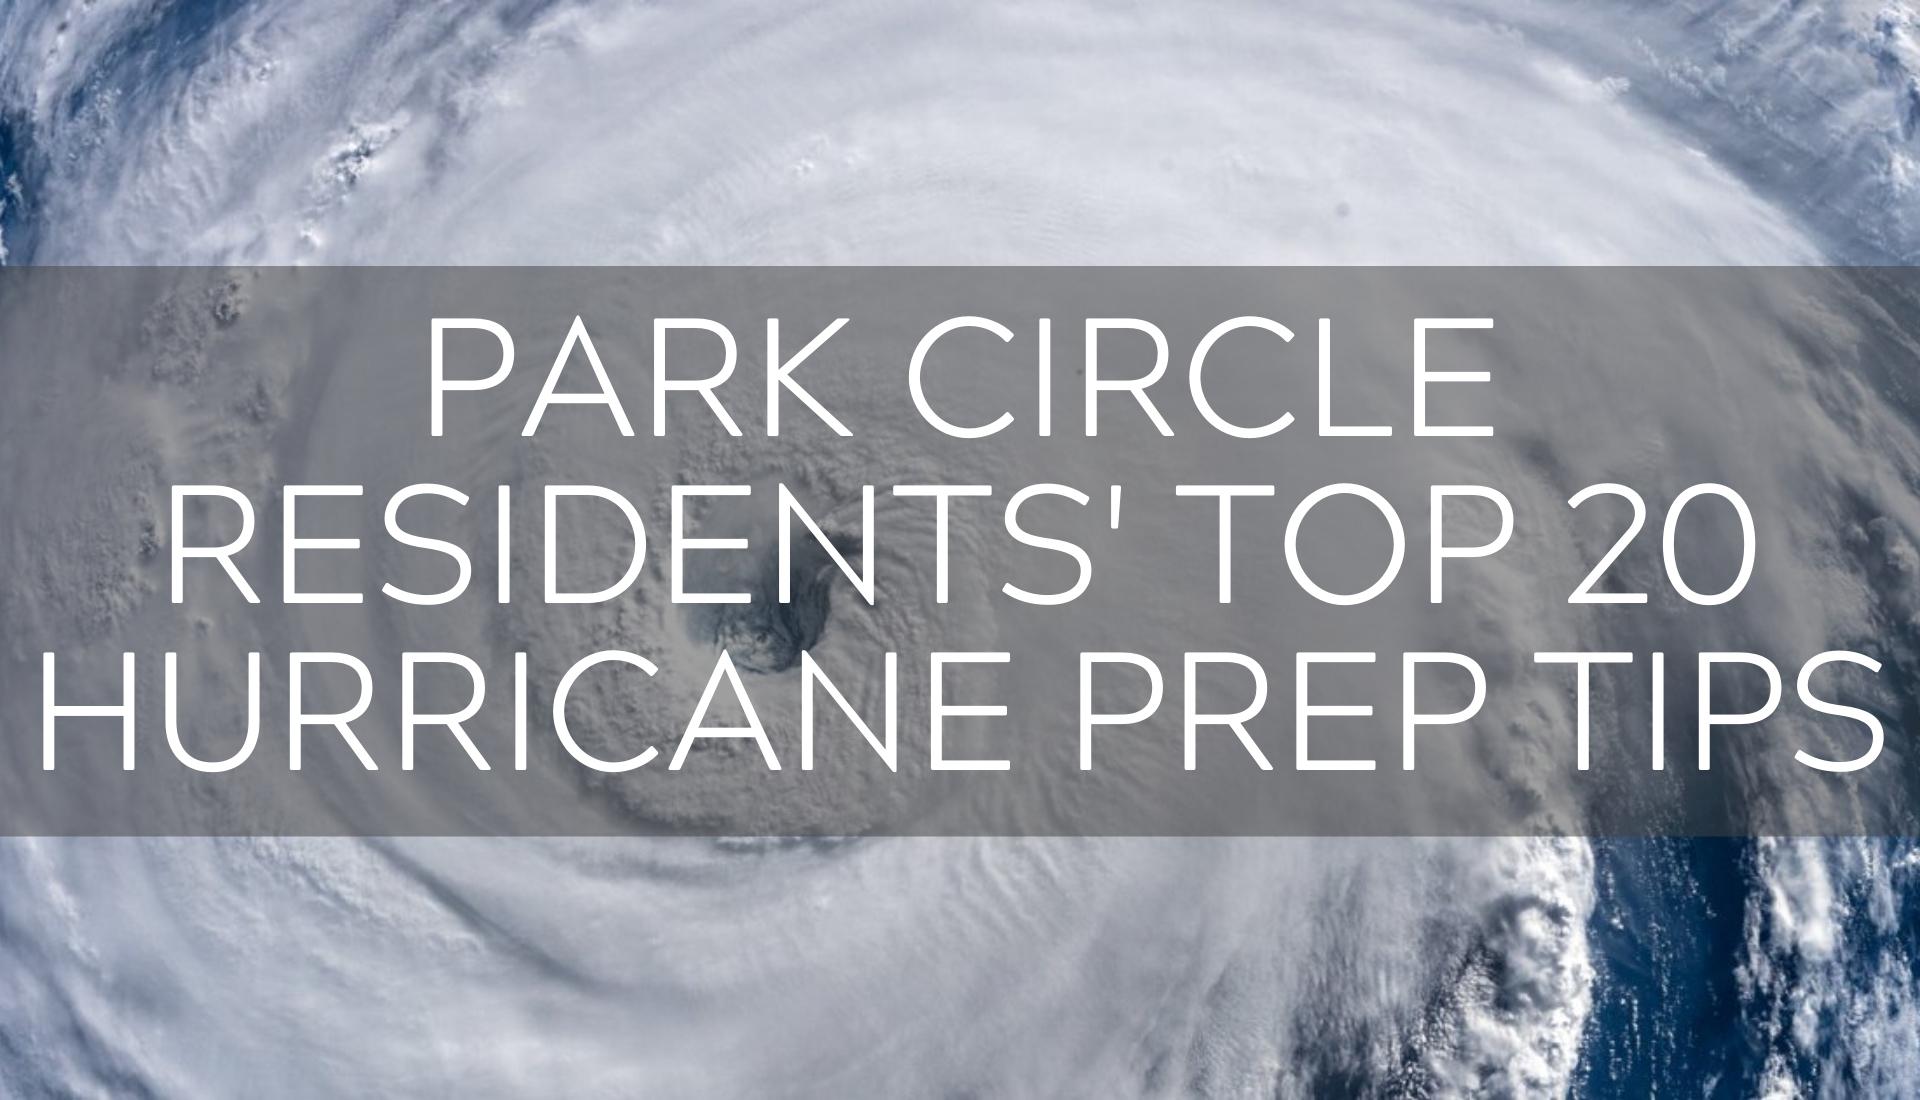 Park Circle Residents' Top 20 Hurricane Prep Tips